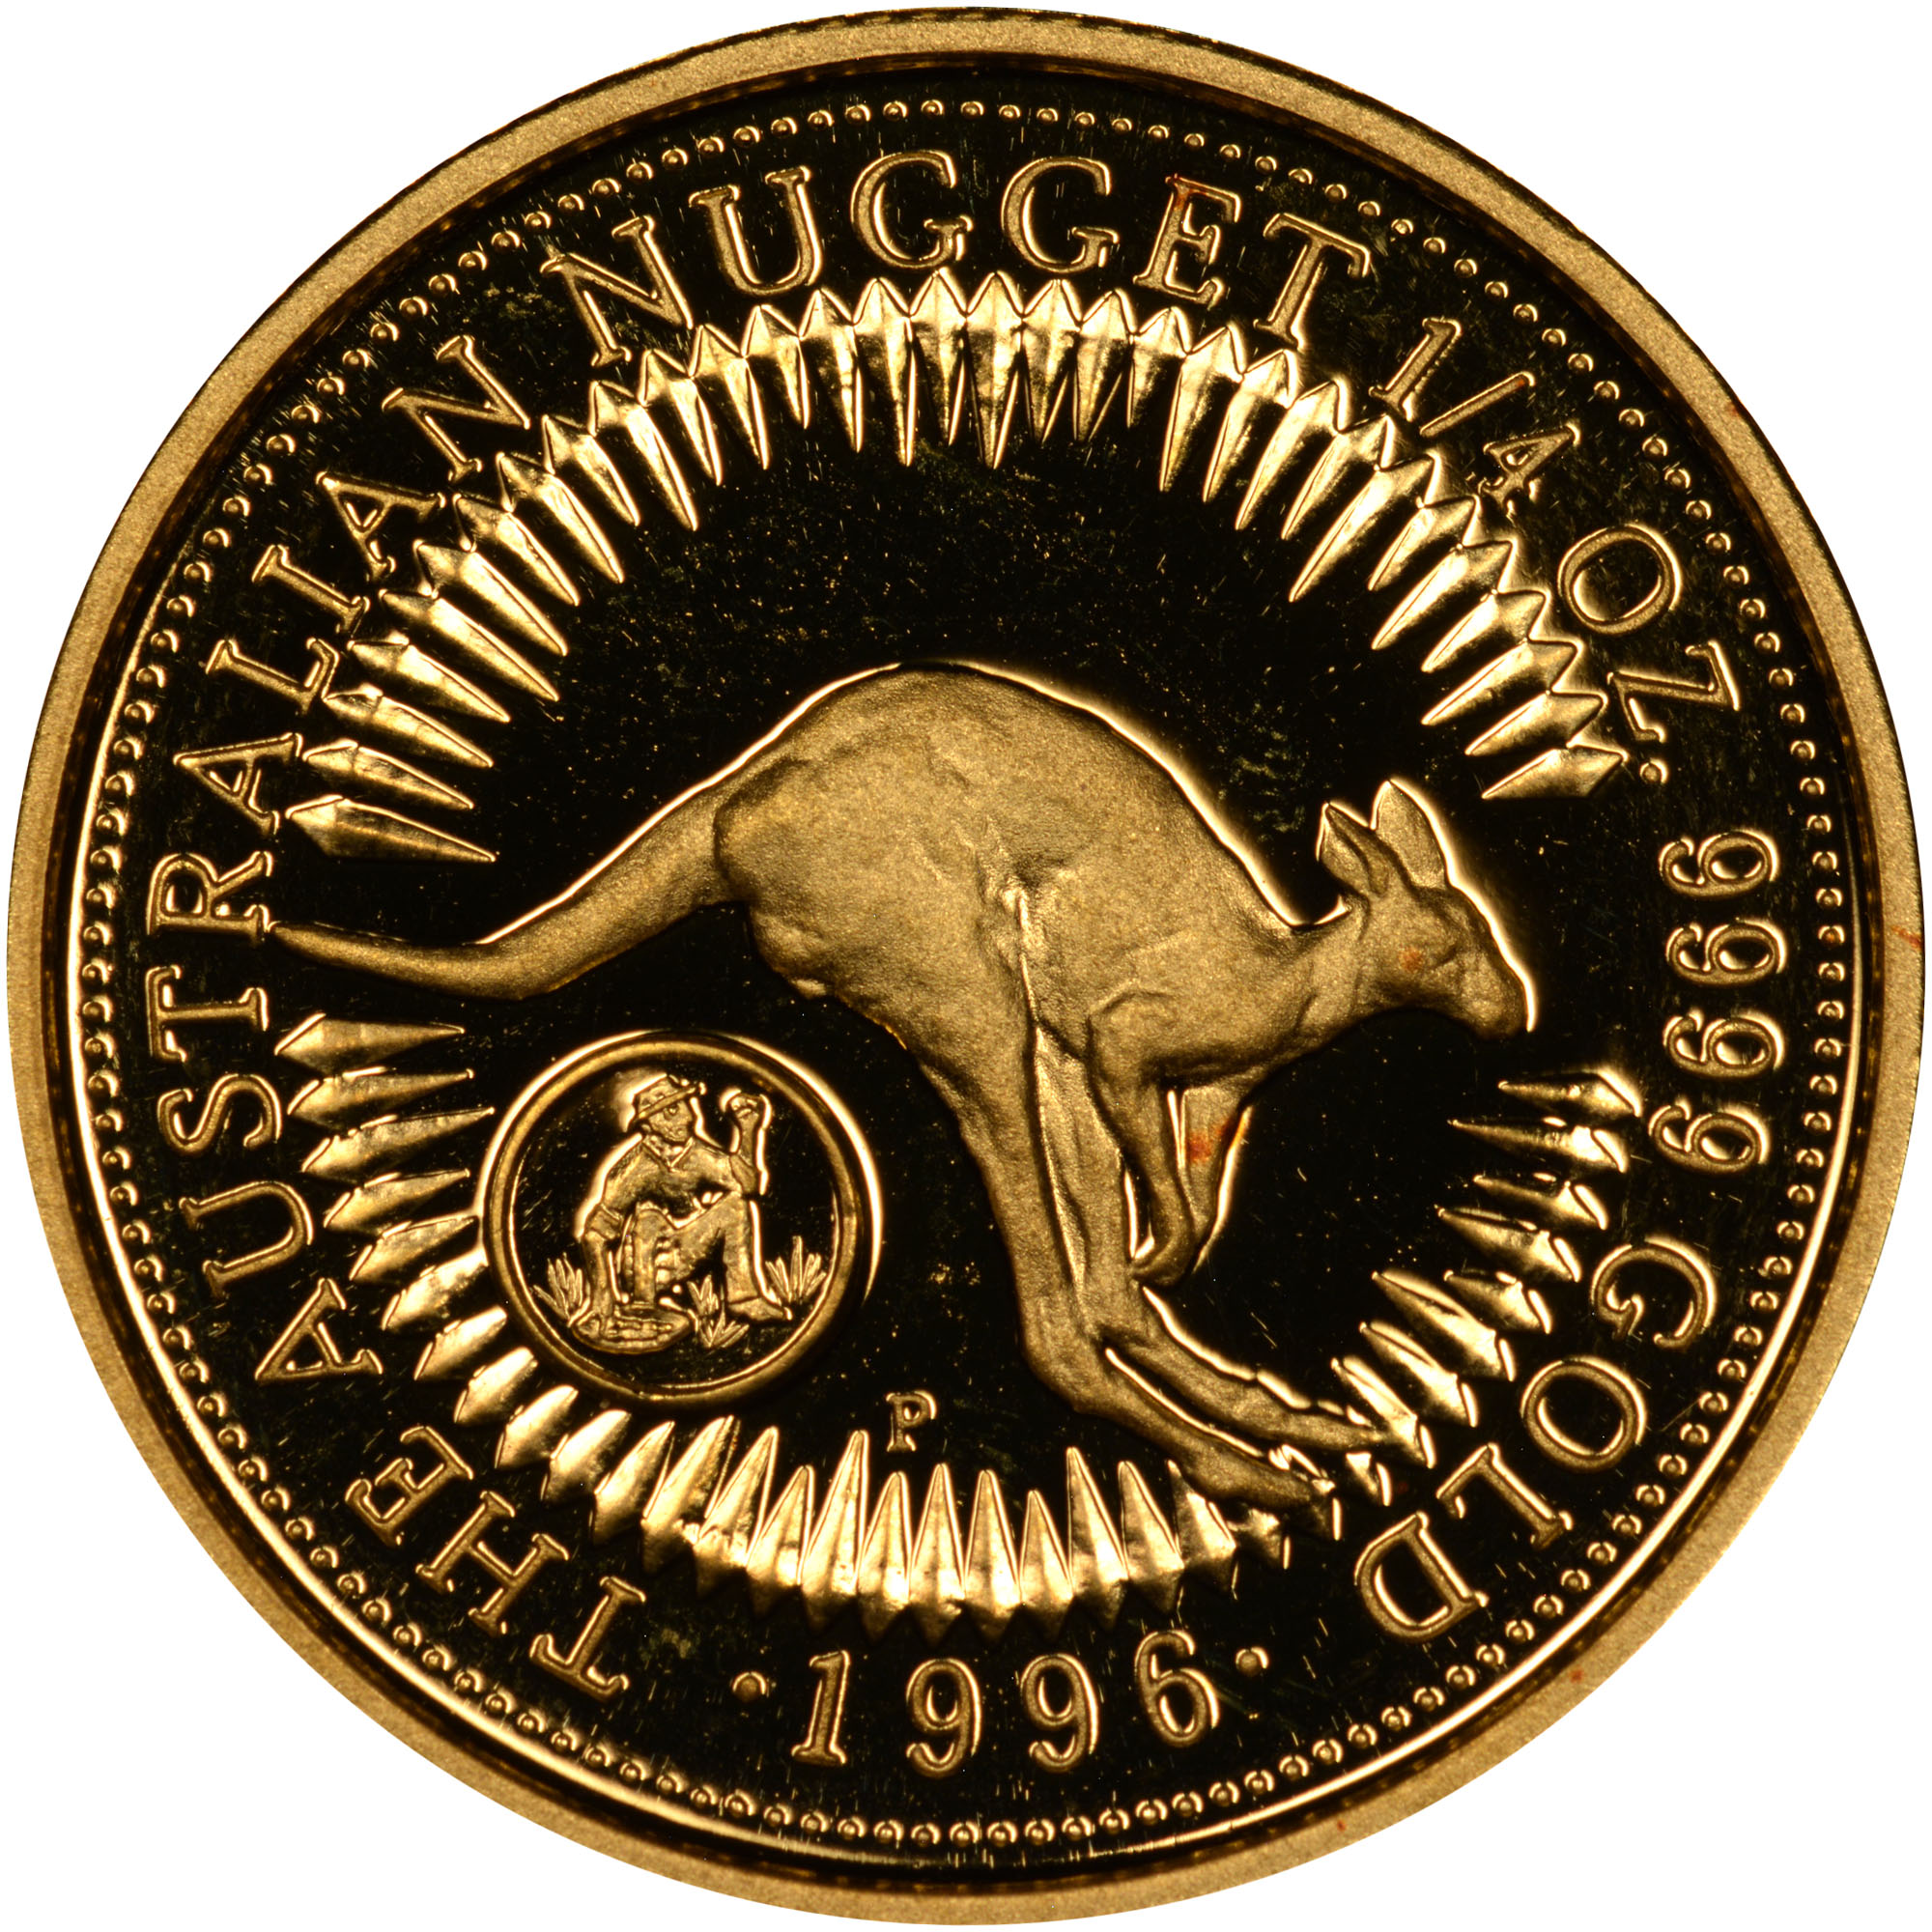 1996 Australia 25 Dollars reverse